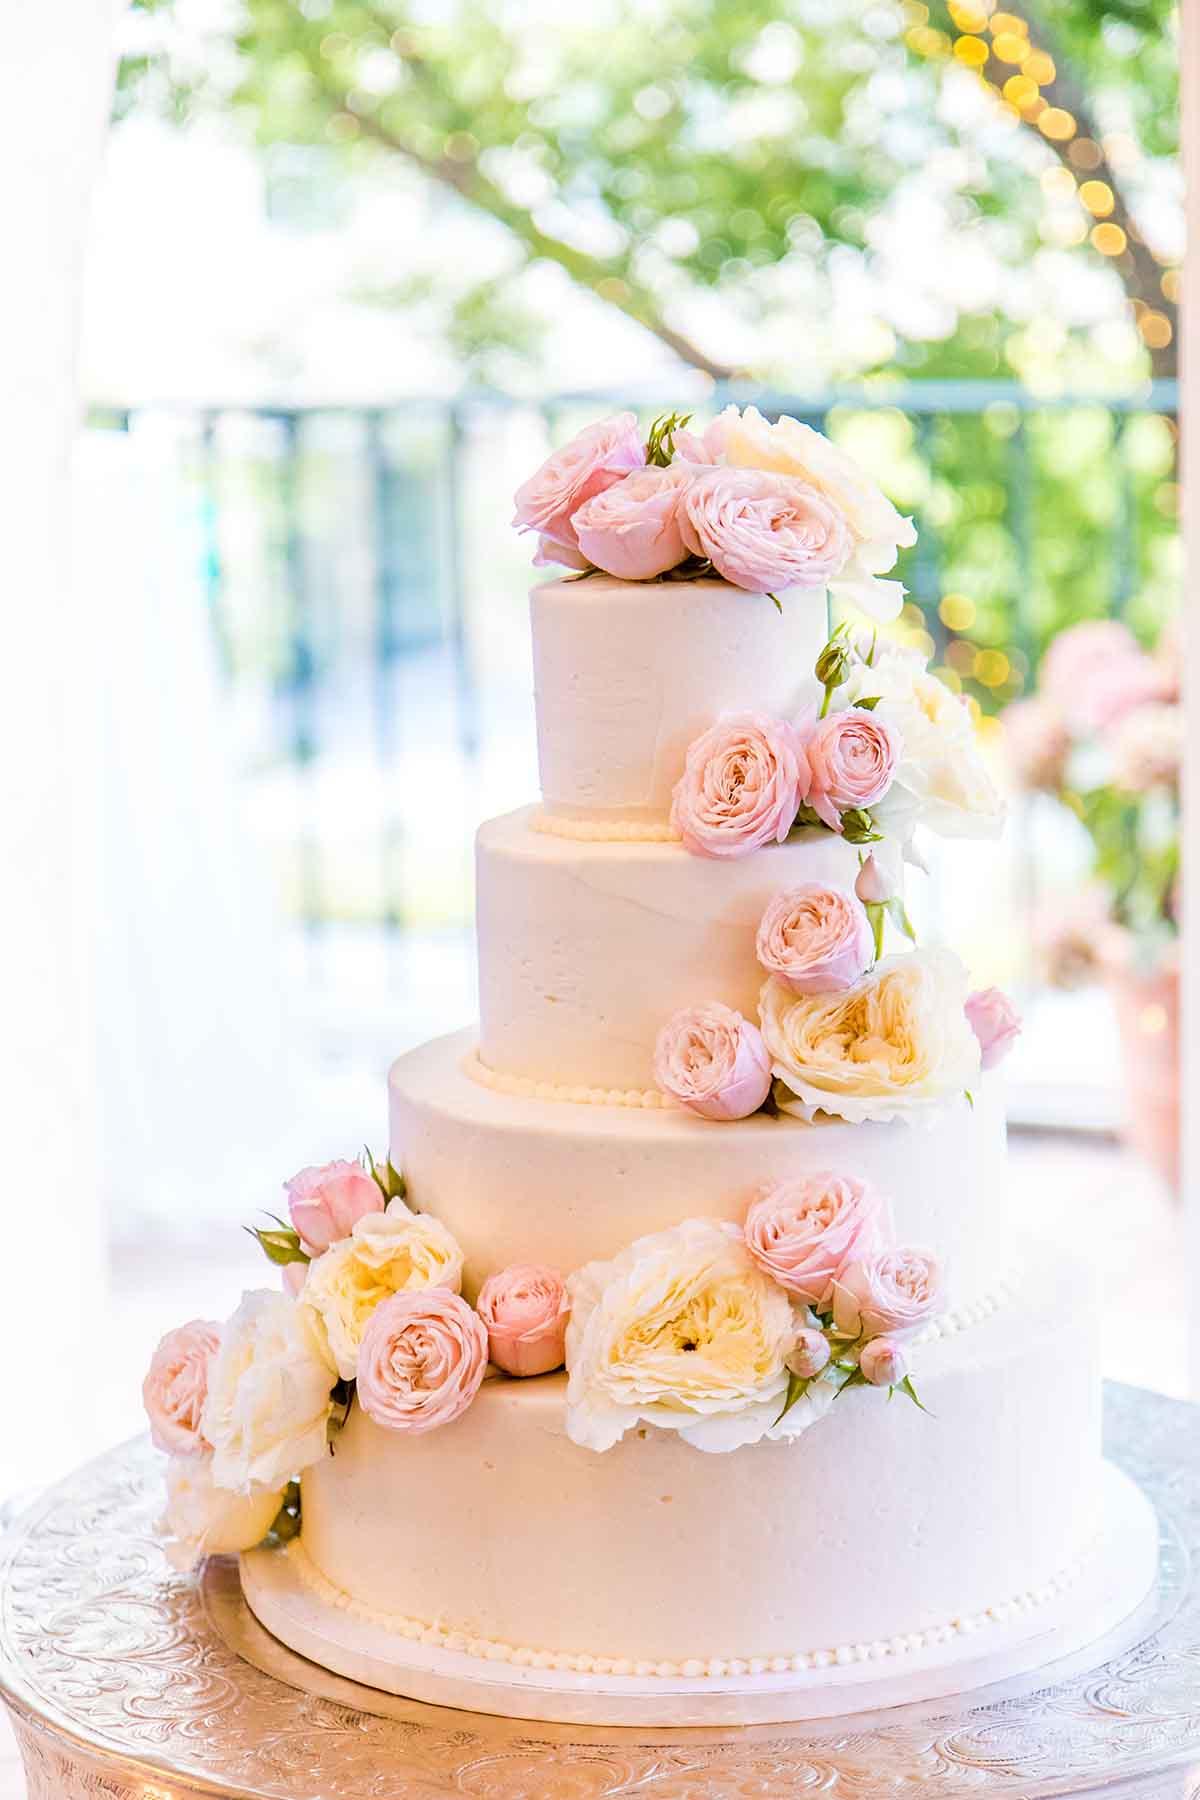 Four tier pink wedding cake